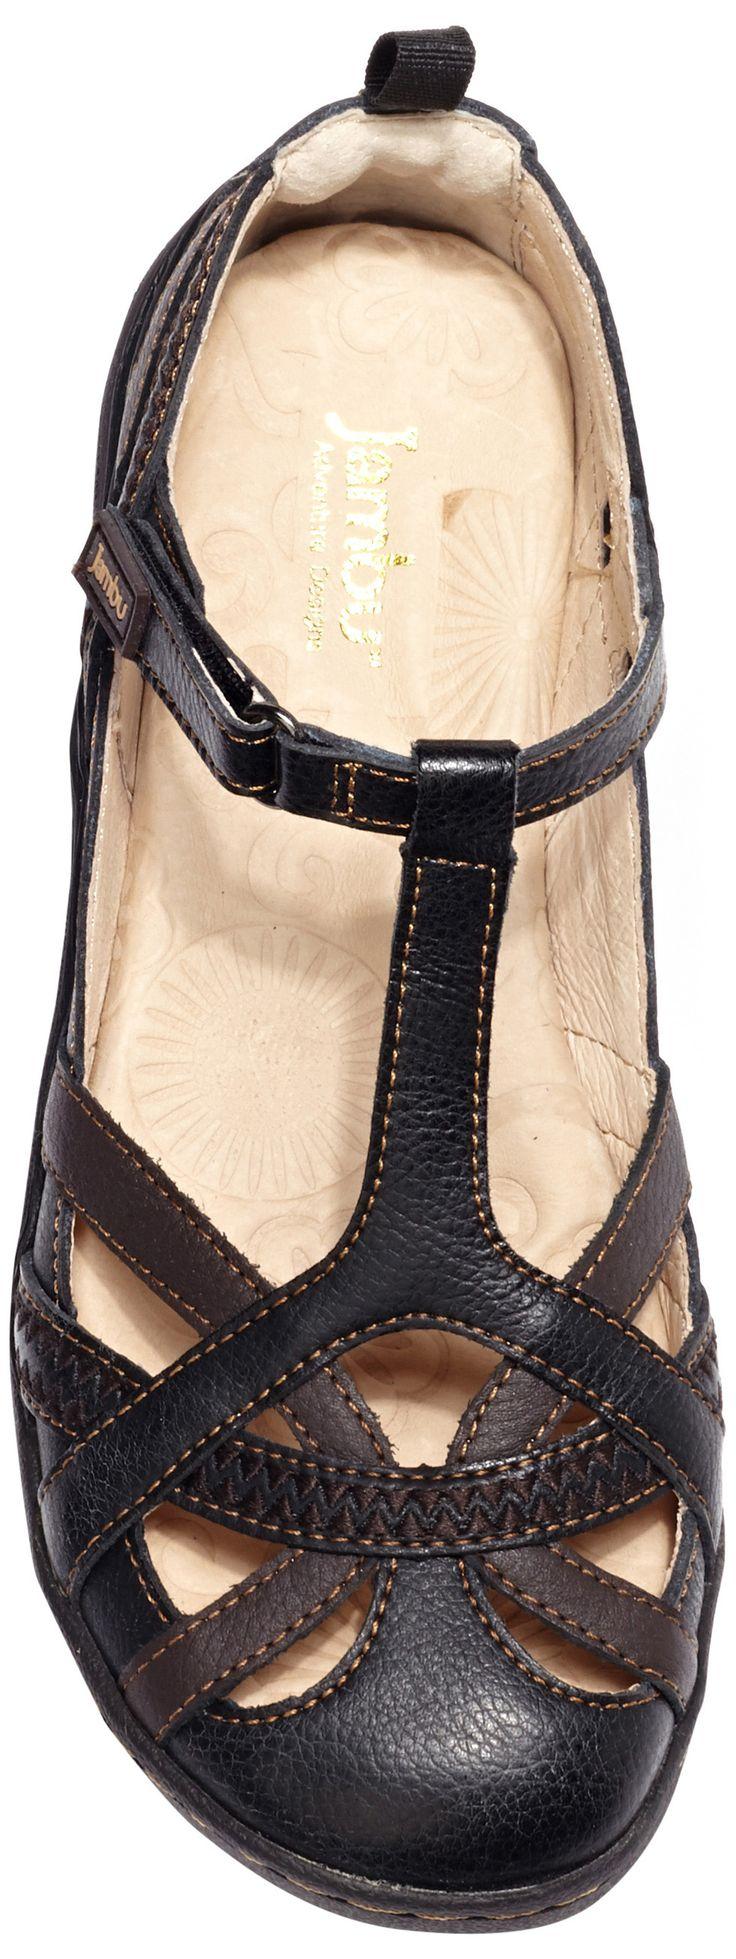 Best 25 Women Sandals Ideas Only On Pinterest Sandals